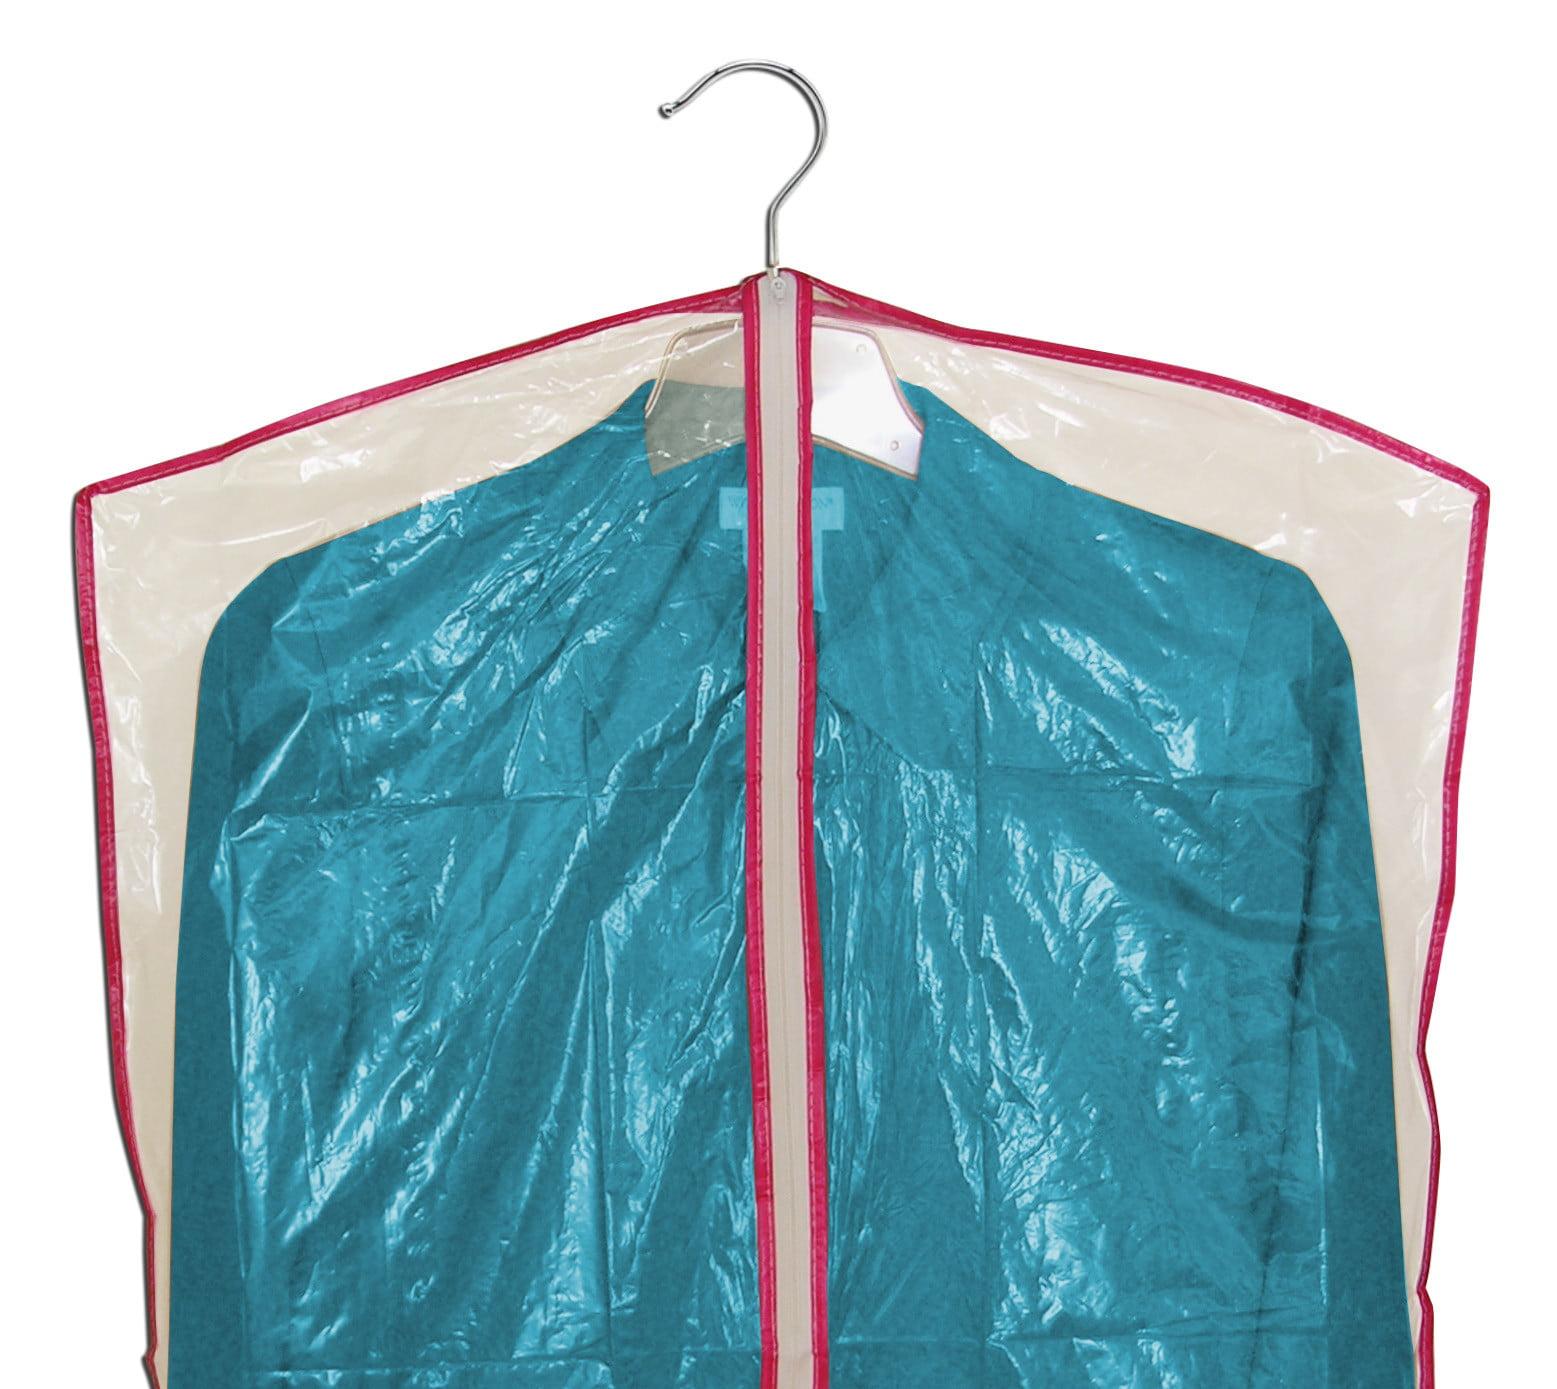 Storage Dynamics Zippered Garment Bag (Set of 13) - Walmart.com